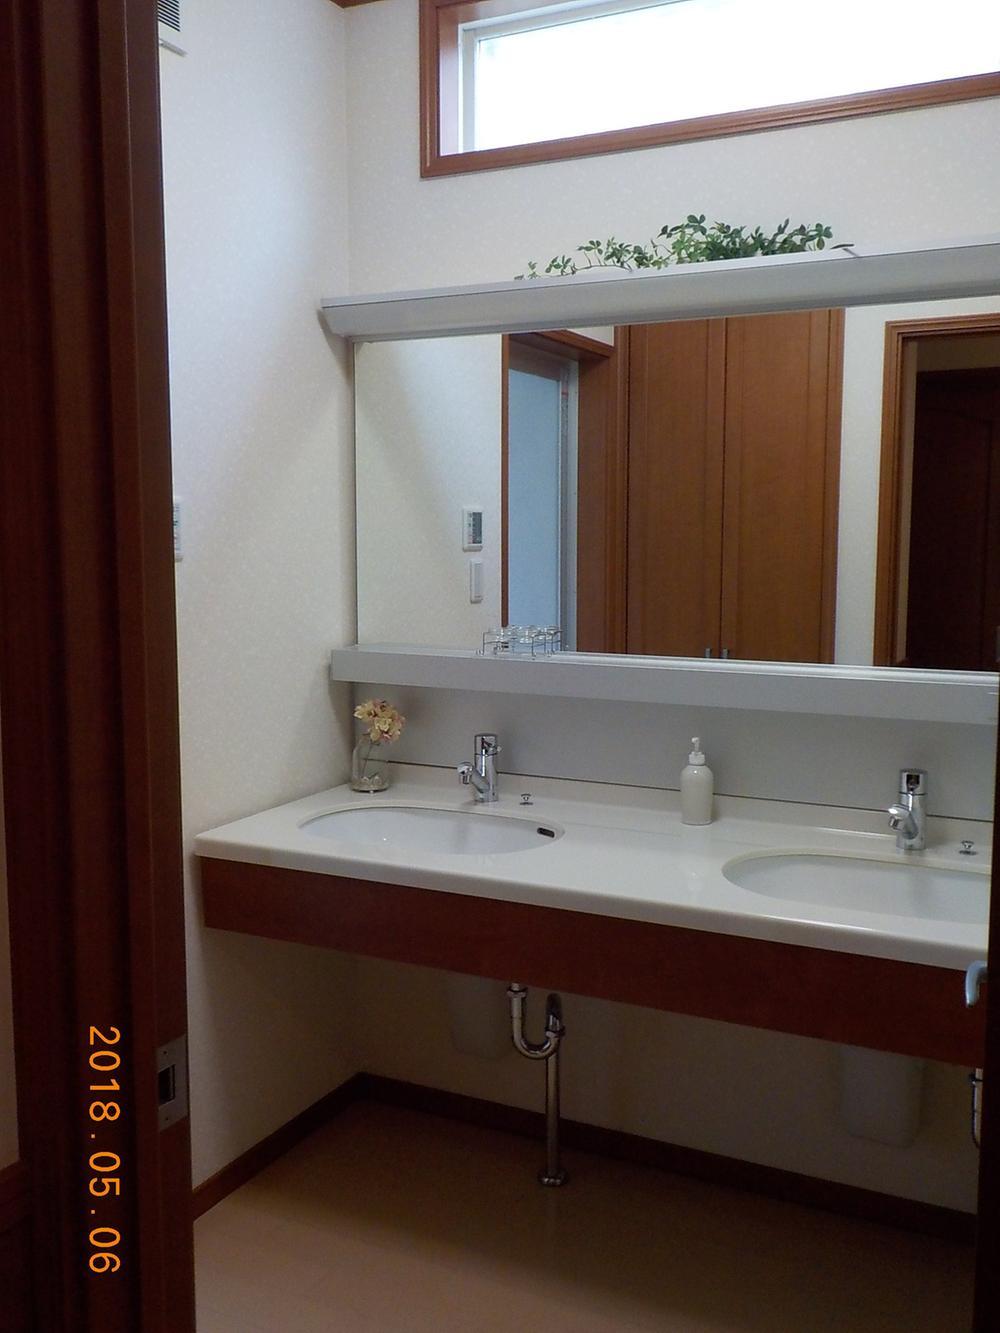 建物プラン例(C号地)洗面化粧台